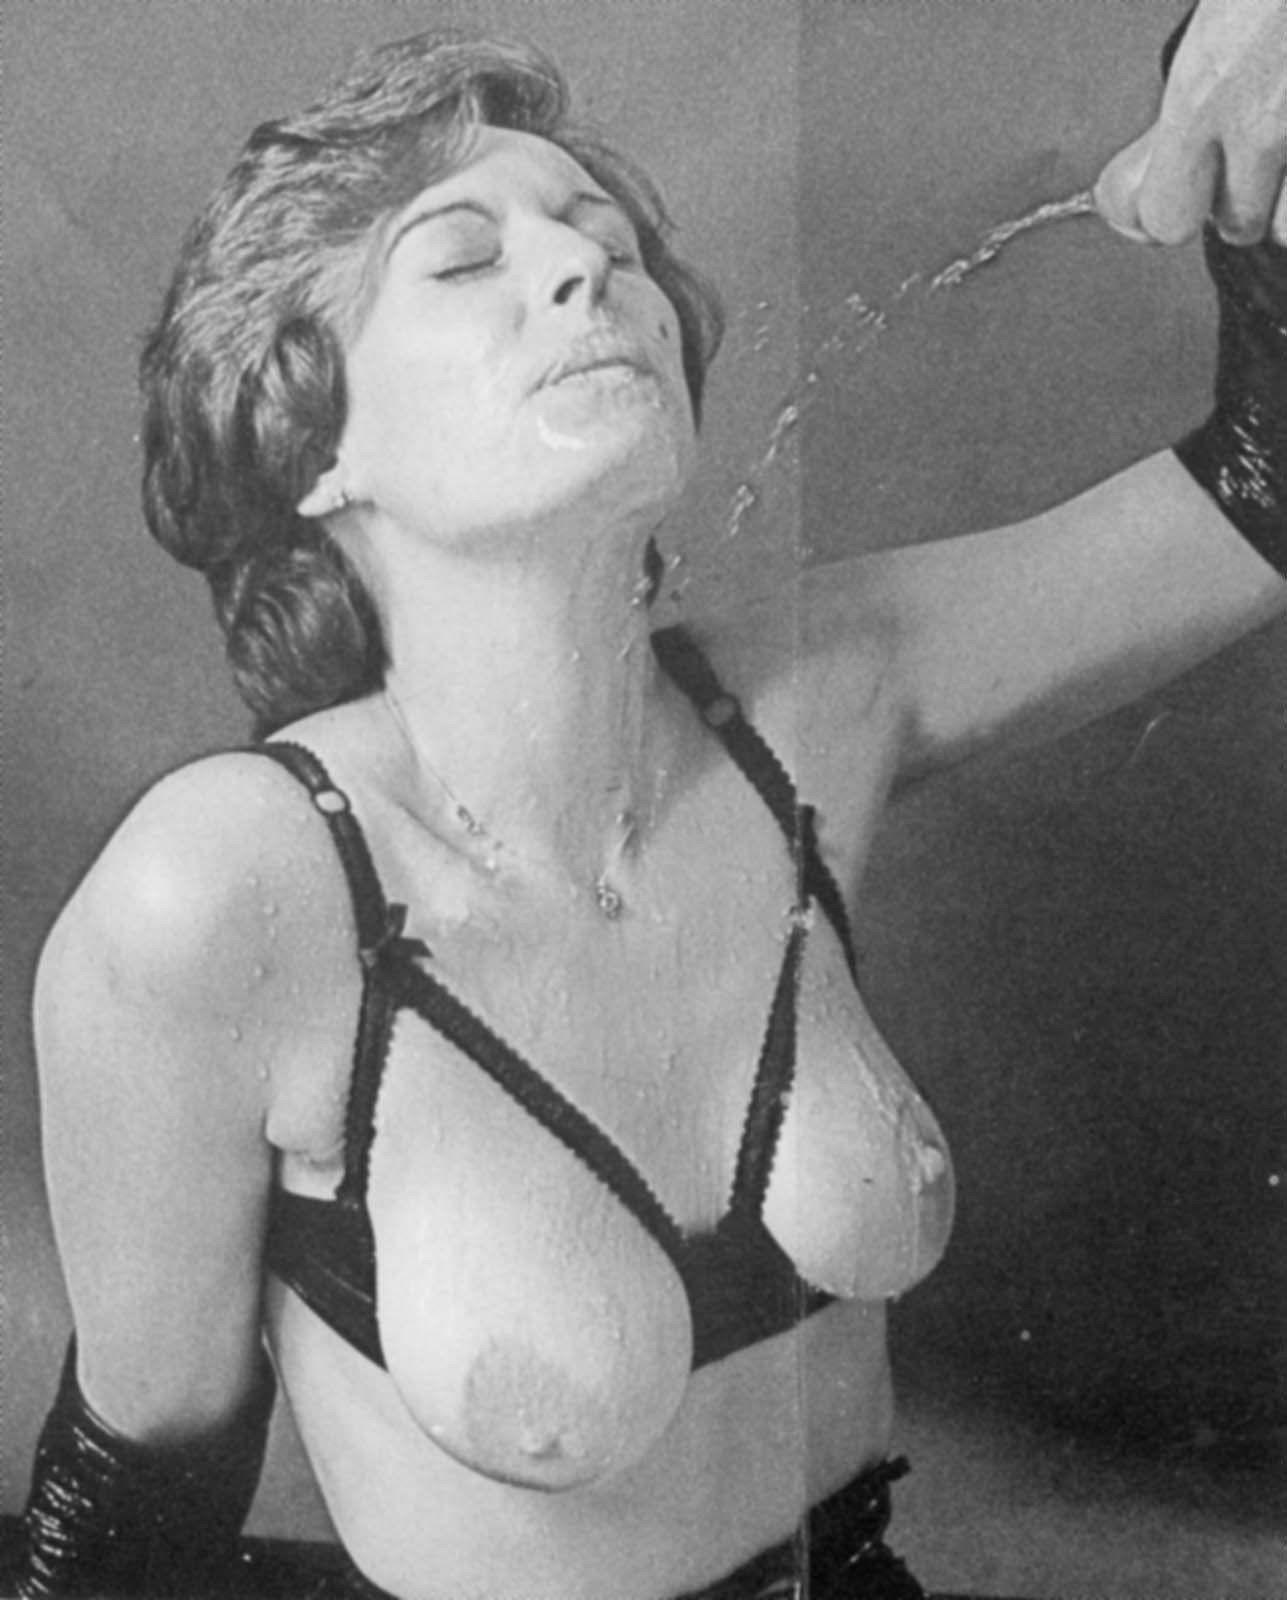 vintage enema bilder